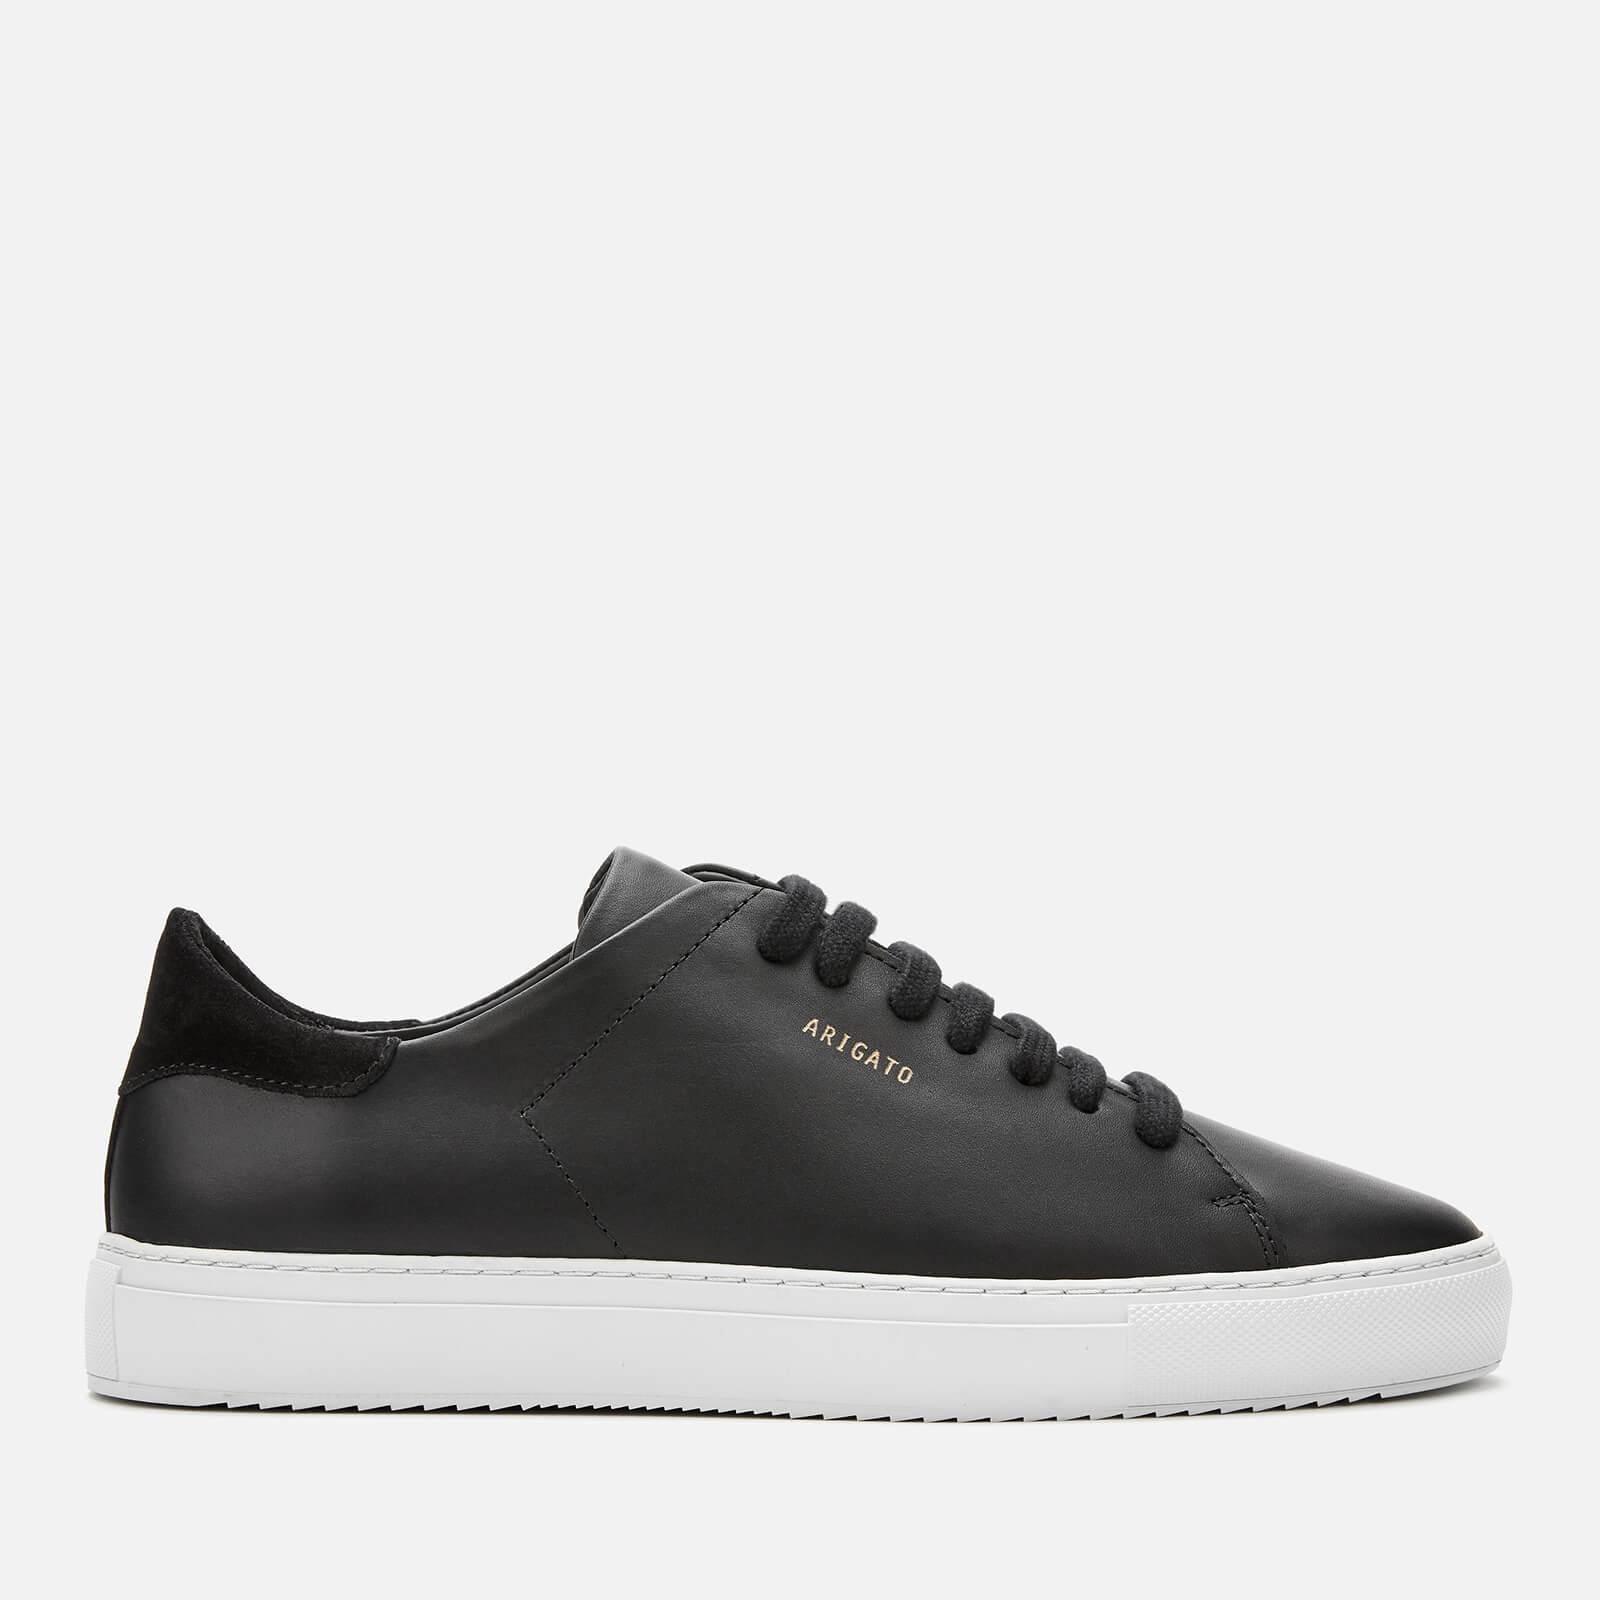 Axel Arigato Men's Clean 90 Leather